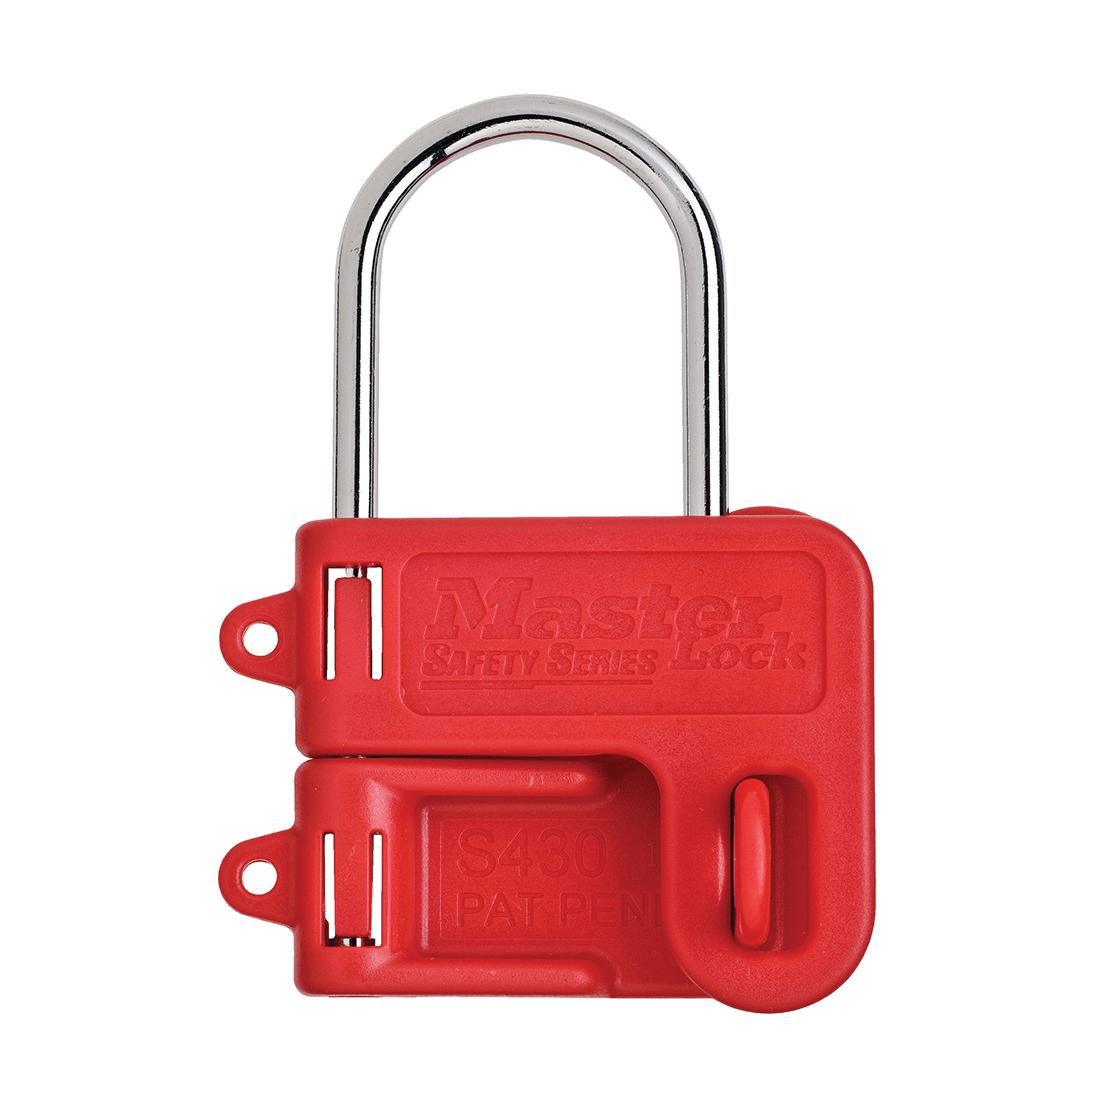 Master Lock® S430 Lockout Hasp With Red Plastic Handle, 8 Padlocks, 9/32 in Dia Max Padlock Shackle, Plastic/Steel